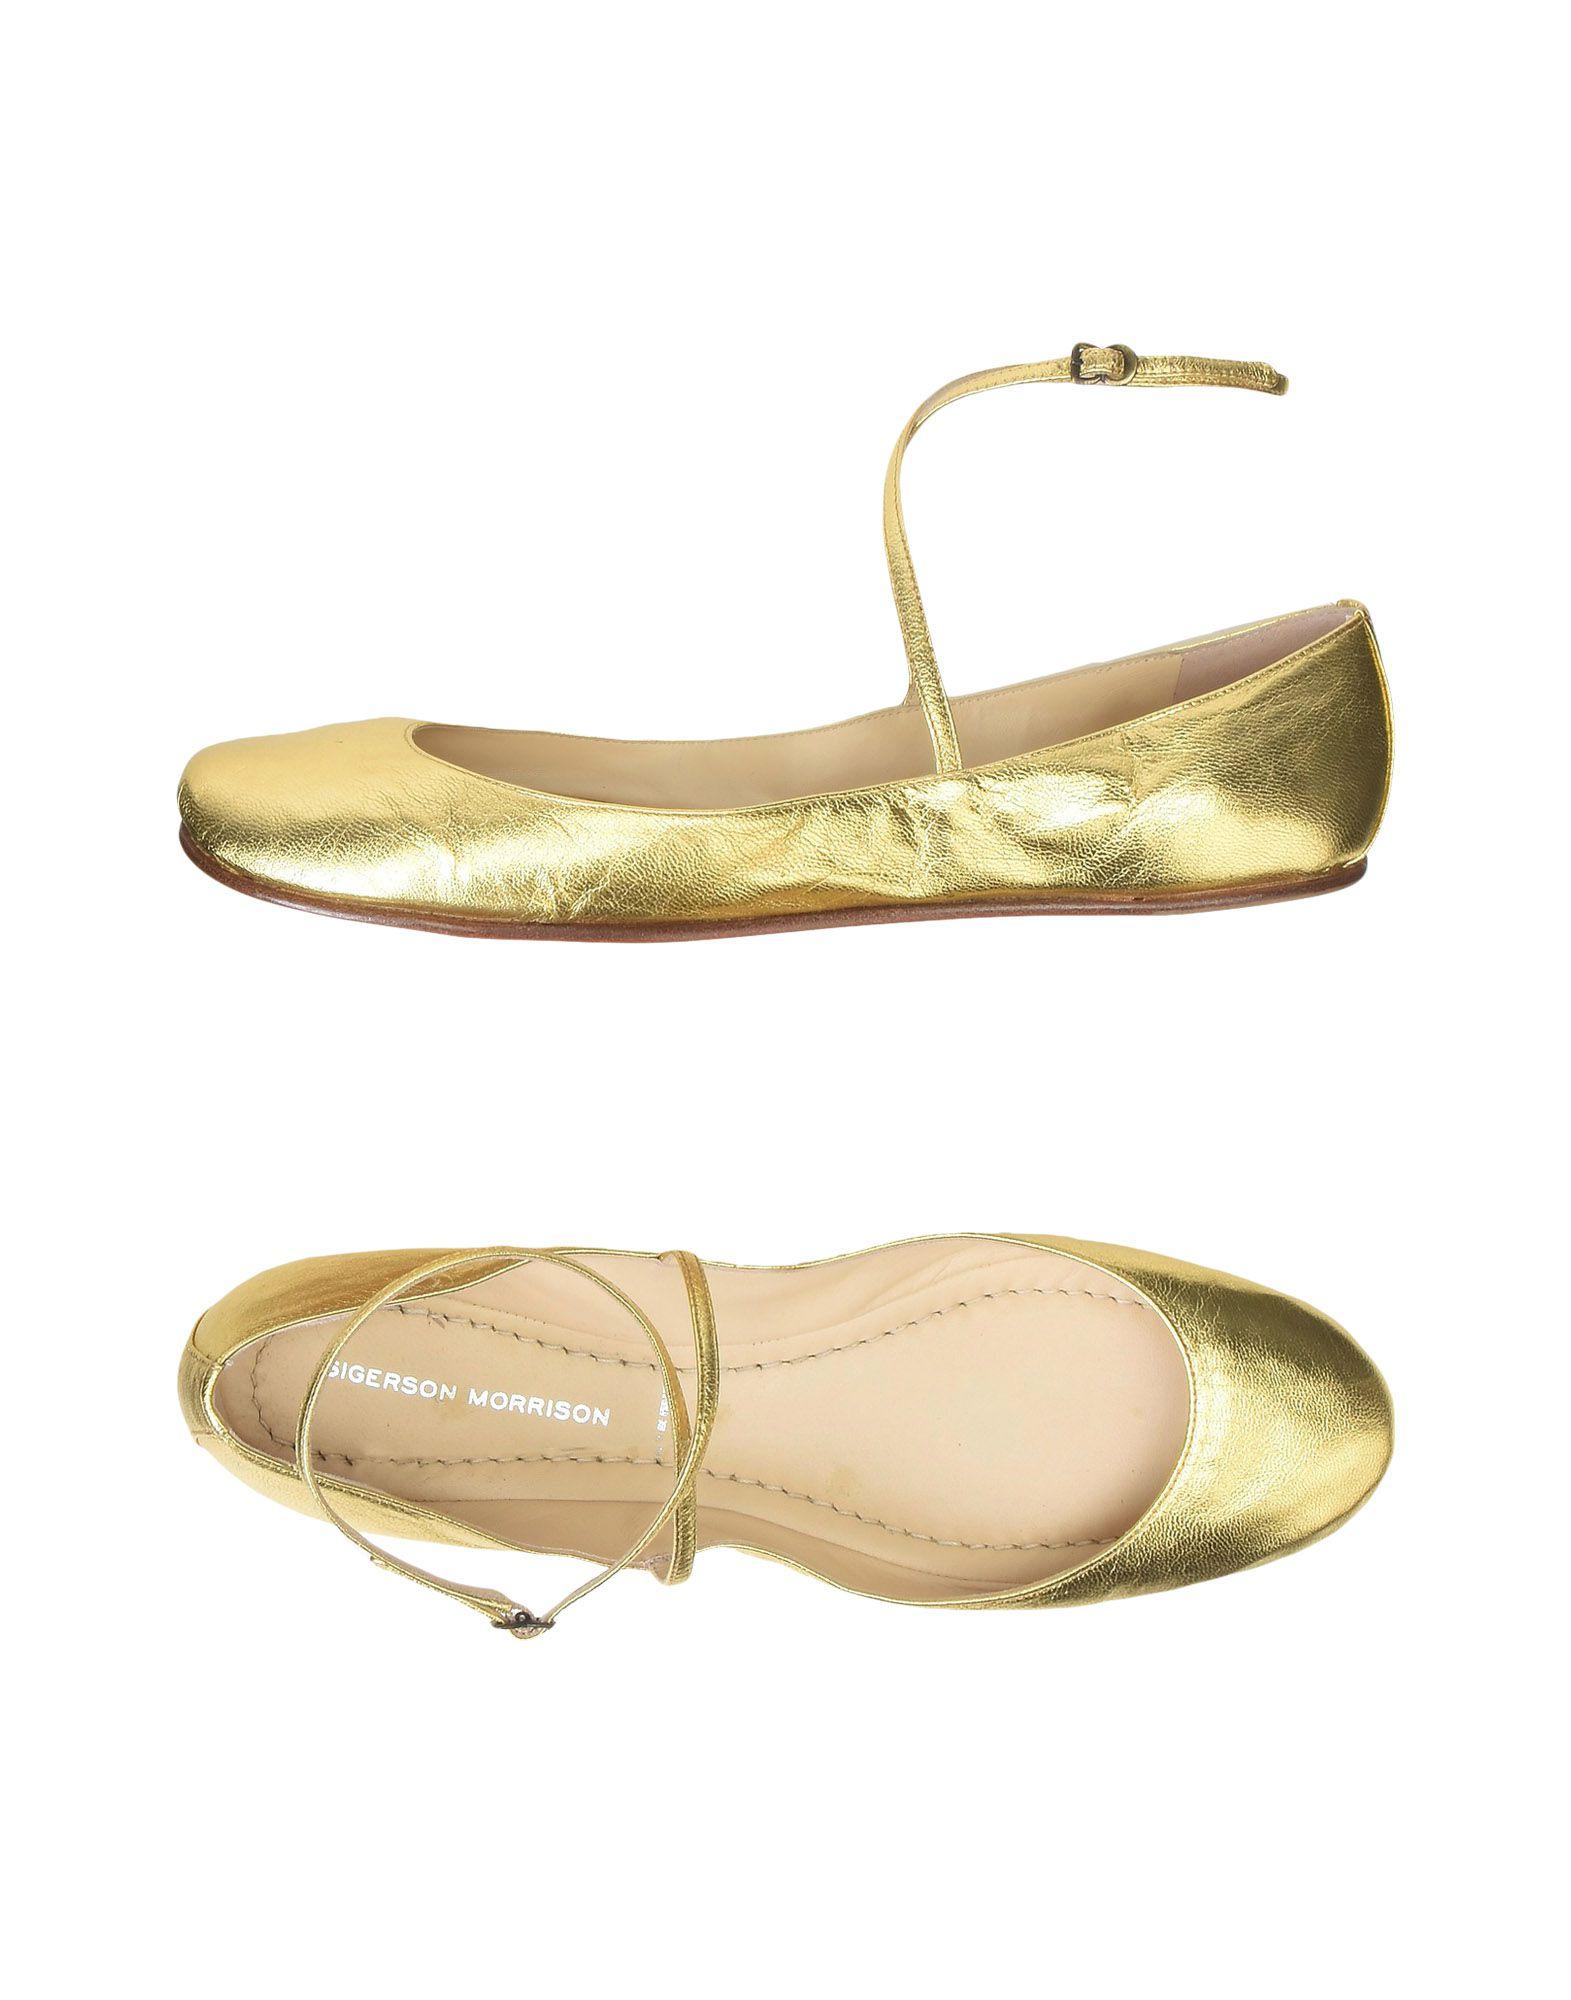 Stilvolle billige Schuhe Damen Sigerson Morrison Ballerinas Damen Schuhe  11499269XI 3add24